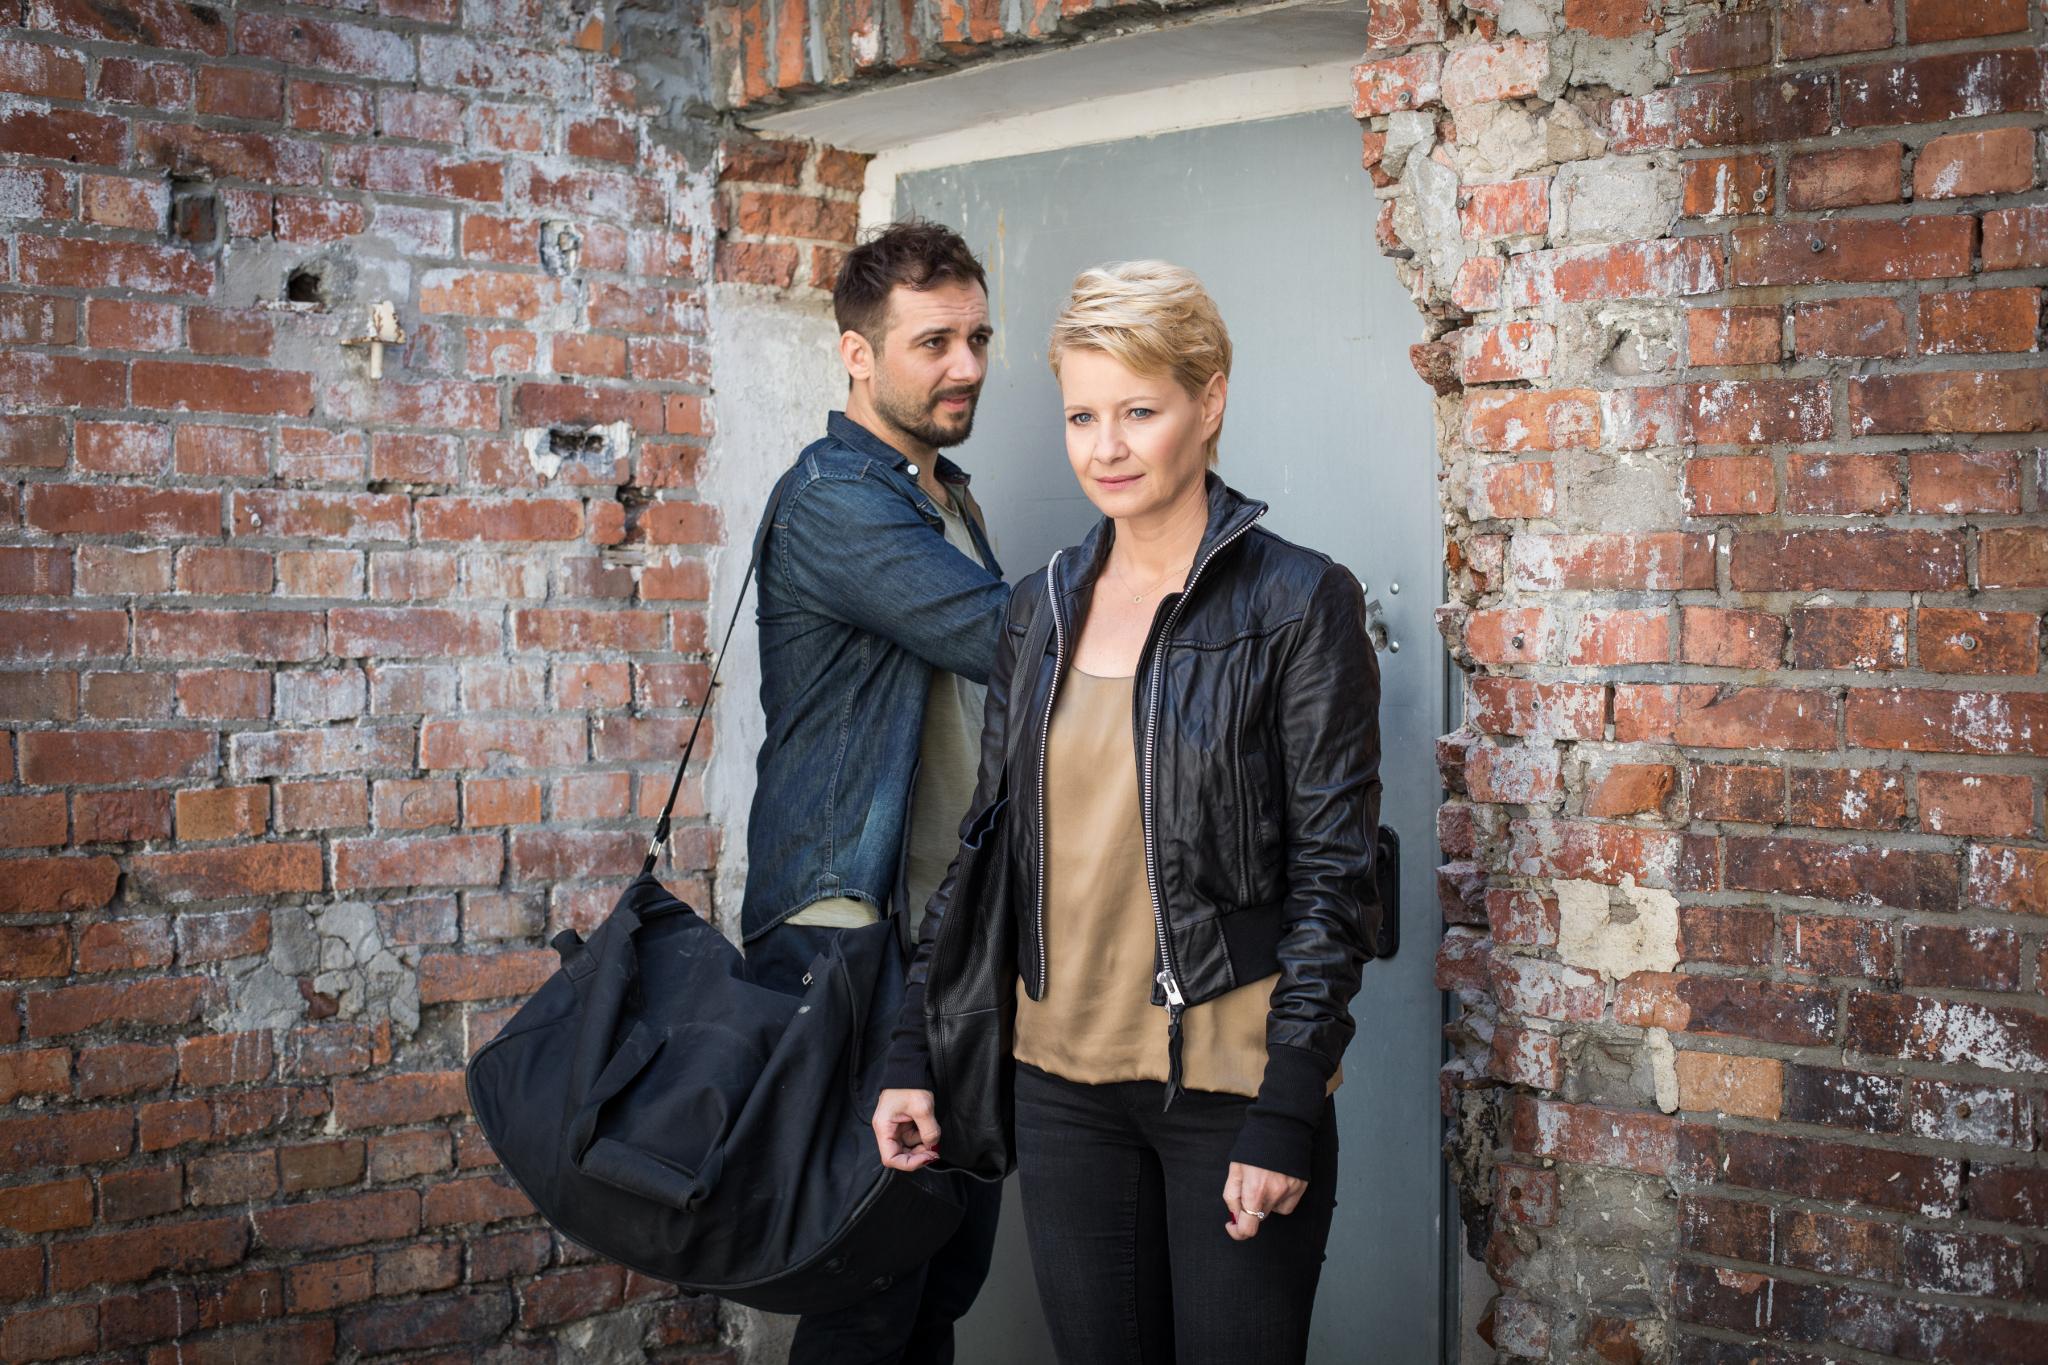 Druga szansa 4 - odcinek 3 - Monika i Piotr